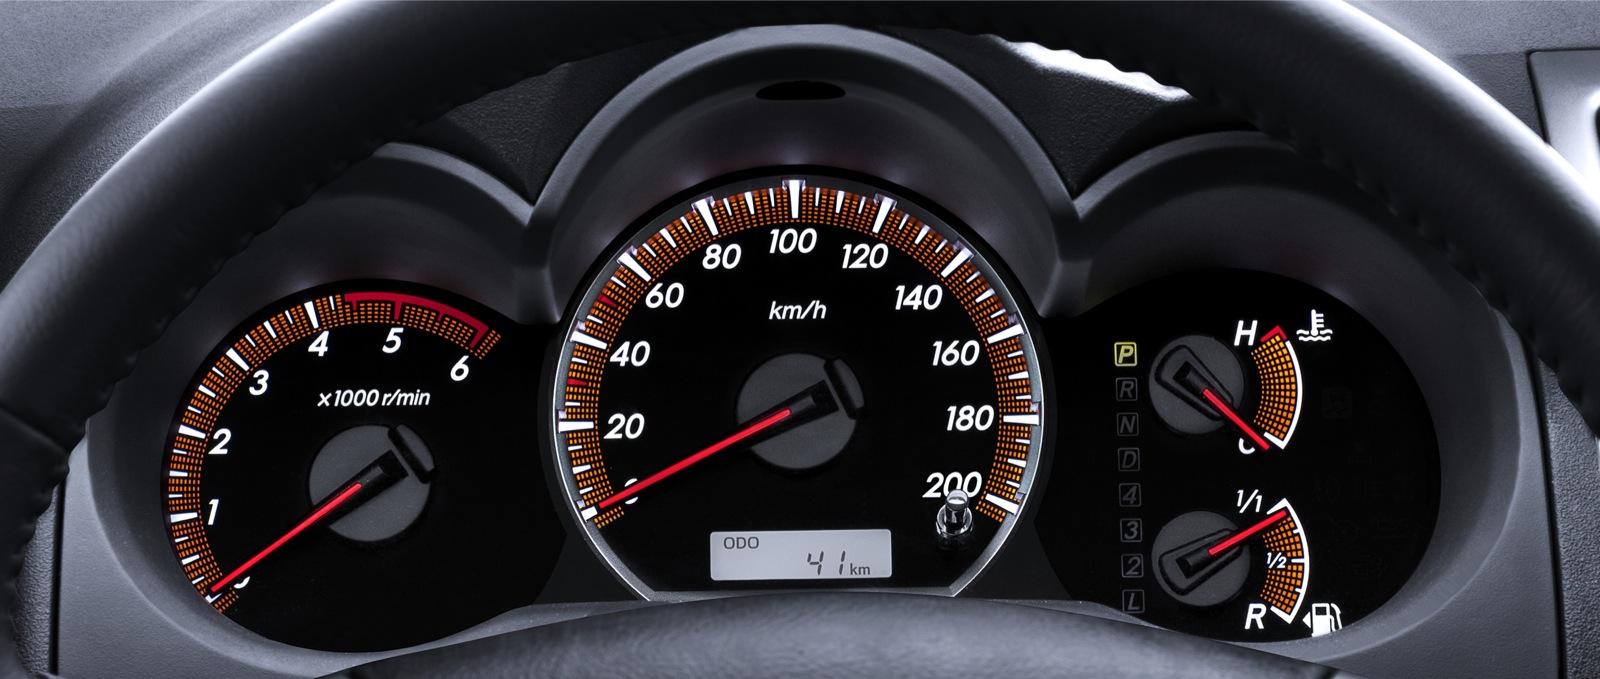 Toyota Hilux Single Cab Specs 2011 2012 2013 2014